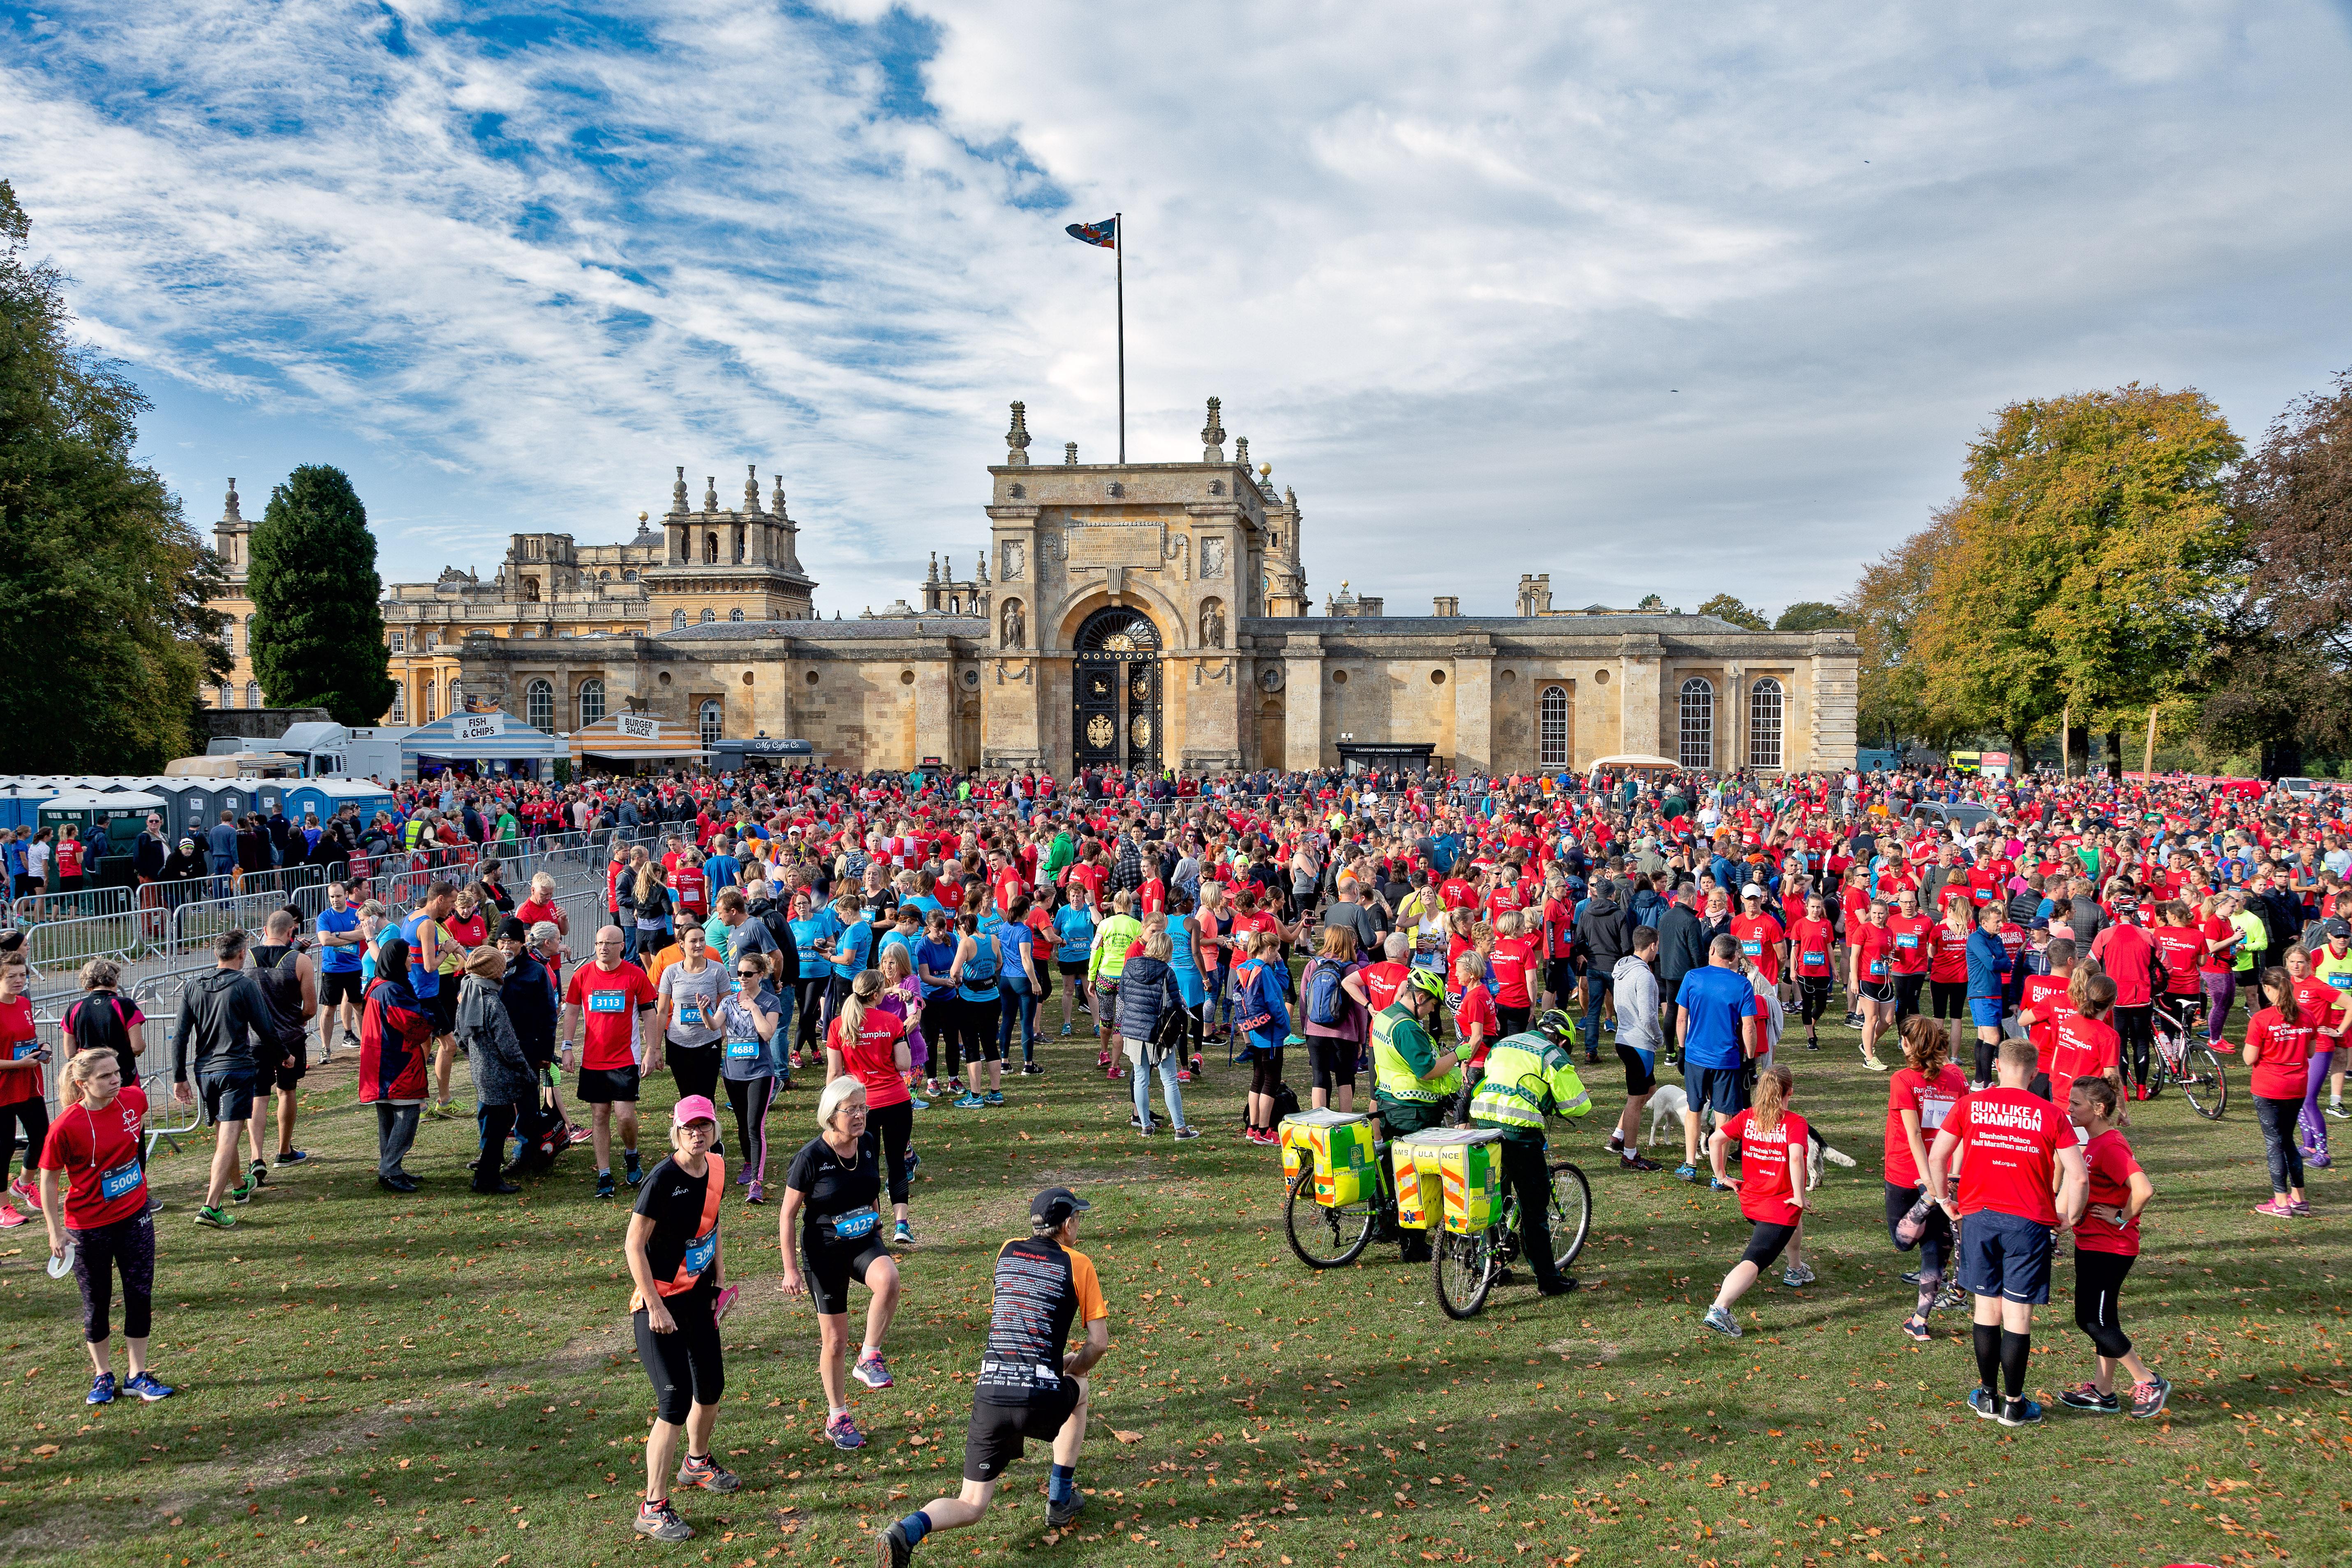 Calendario F1 2020 Sky.The 10 Best Half Marathons In The Uk 2019 20 Calendar